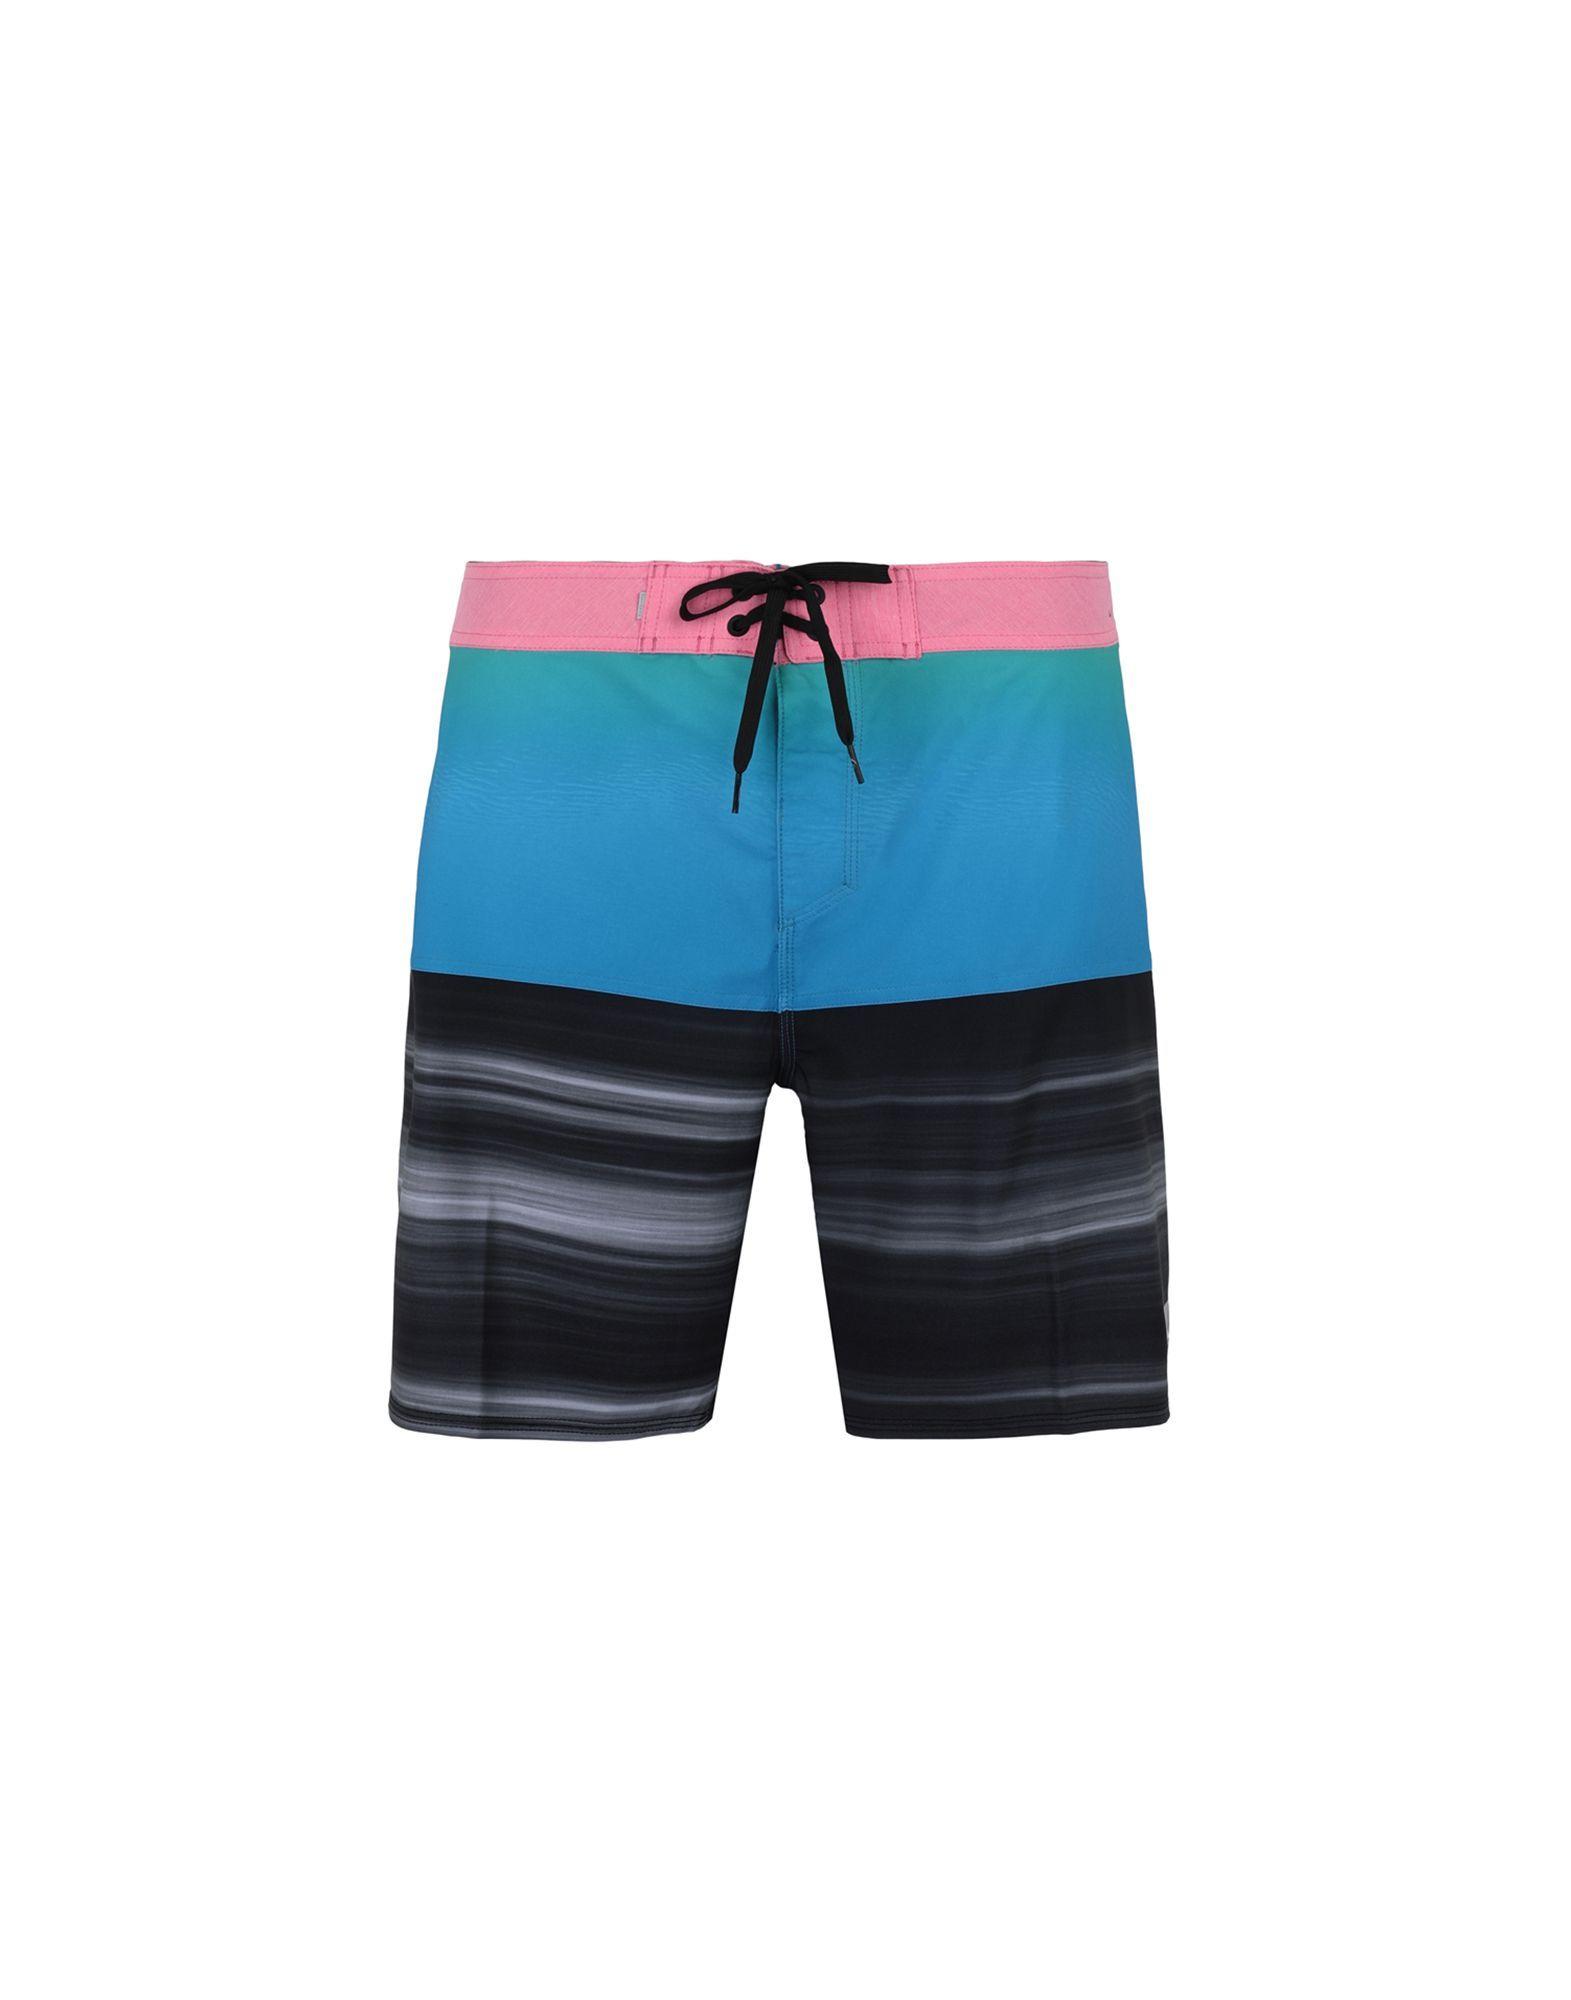 Quiksilver Mens Swell Vision Beachshort 20 Boardshort Swim Trunk